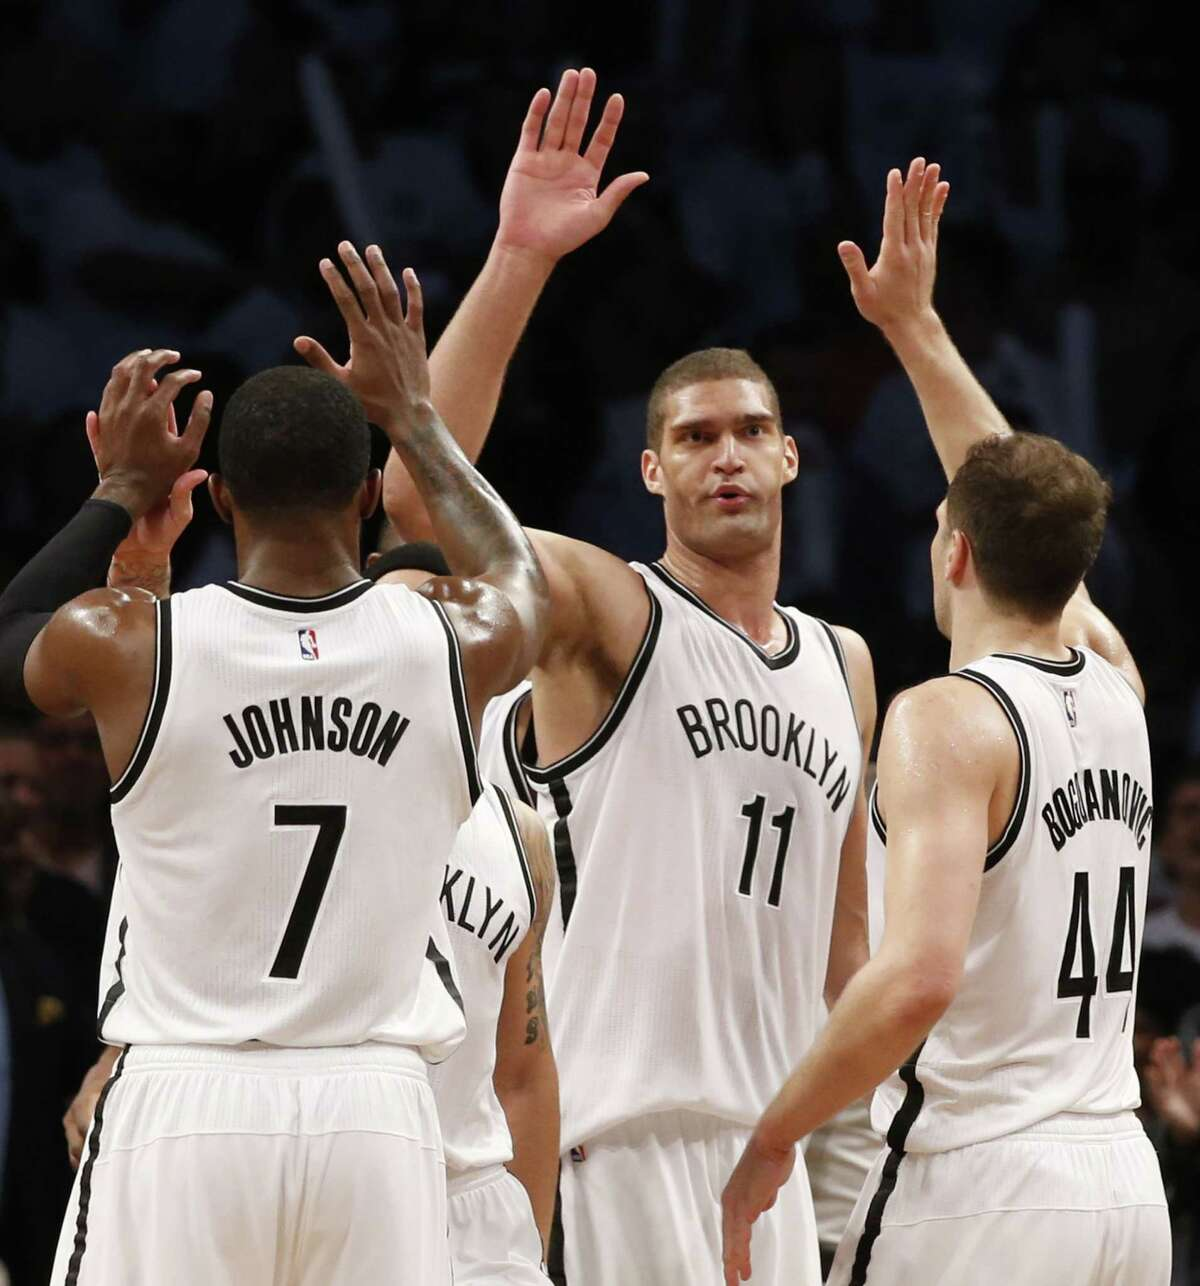 Nets center Brook Lopez (11) celebrates with Nets forward Joe Johnson (7) and guard Bojan Bogdanovic (44) Monday night.